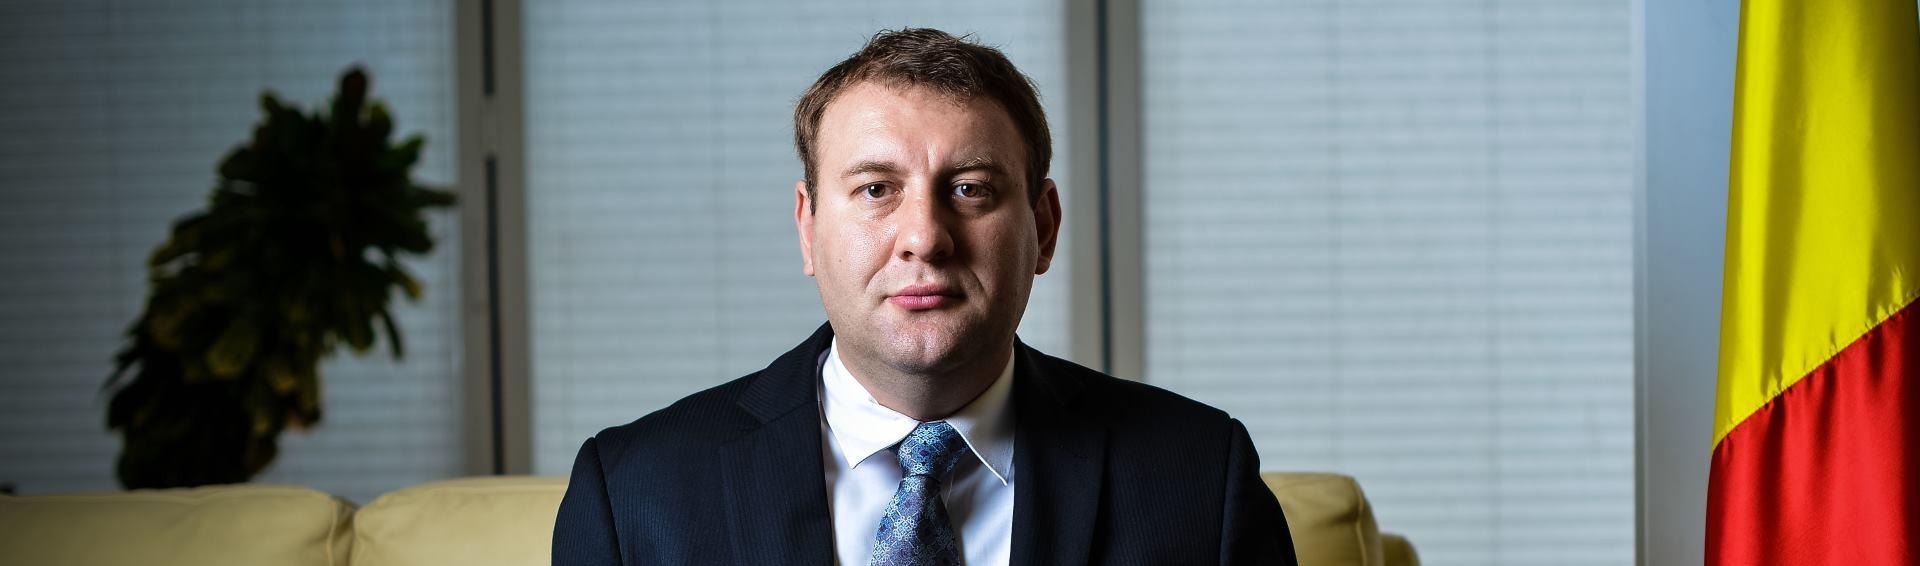 COSMIN GEORGE DINESCU: 'Interes Hrvatske i Rumunjske jest da Balkan postane stabilno područje'